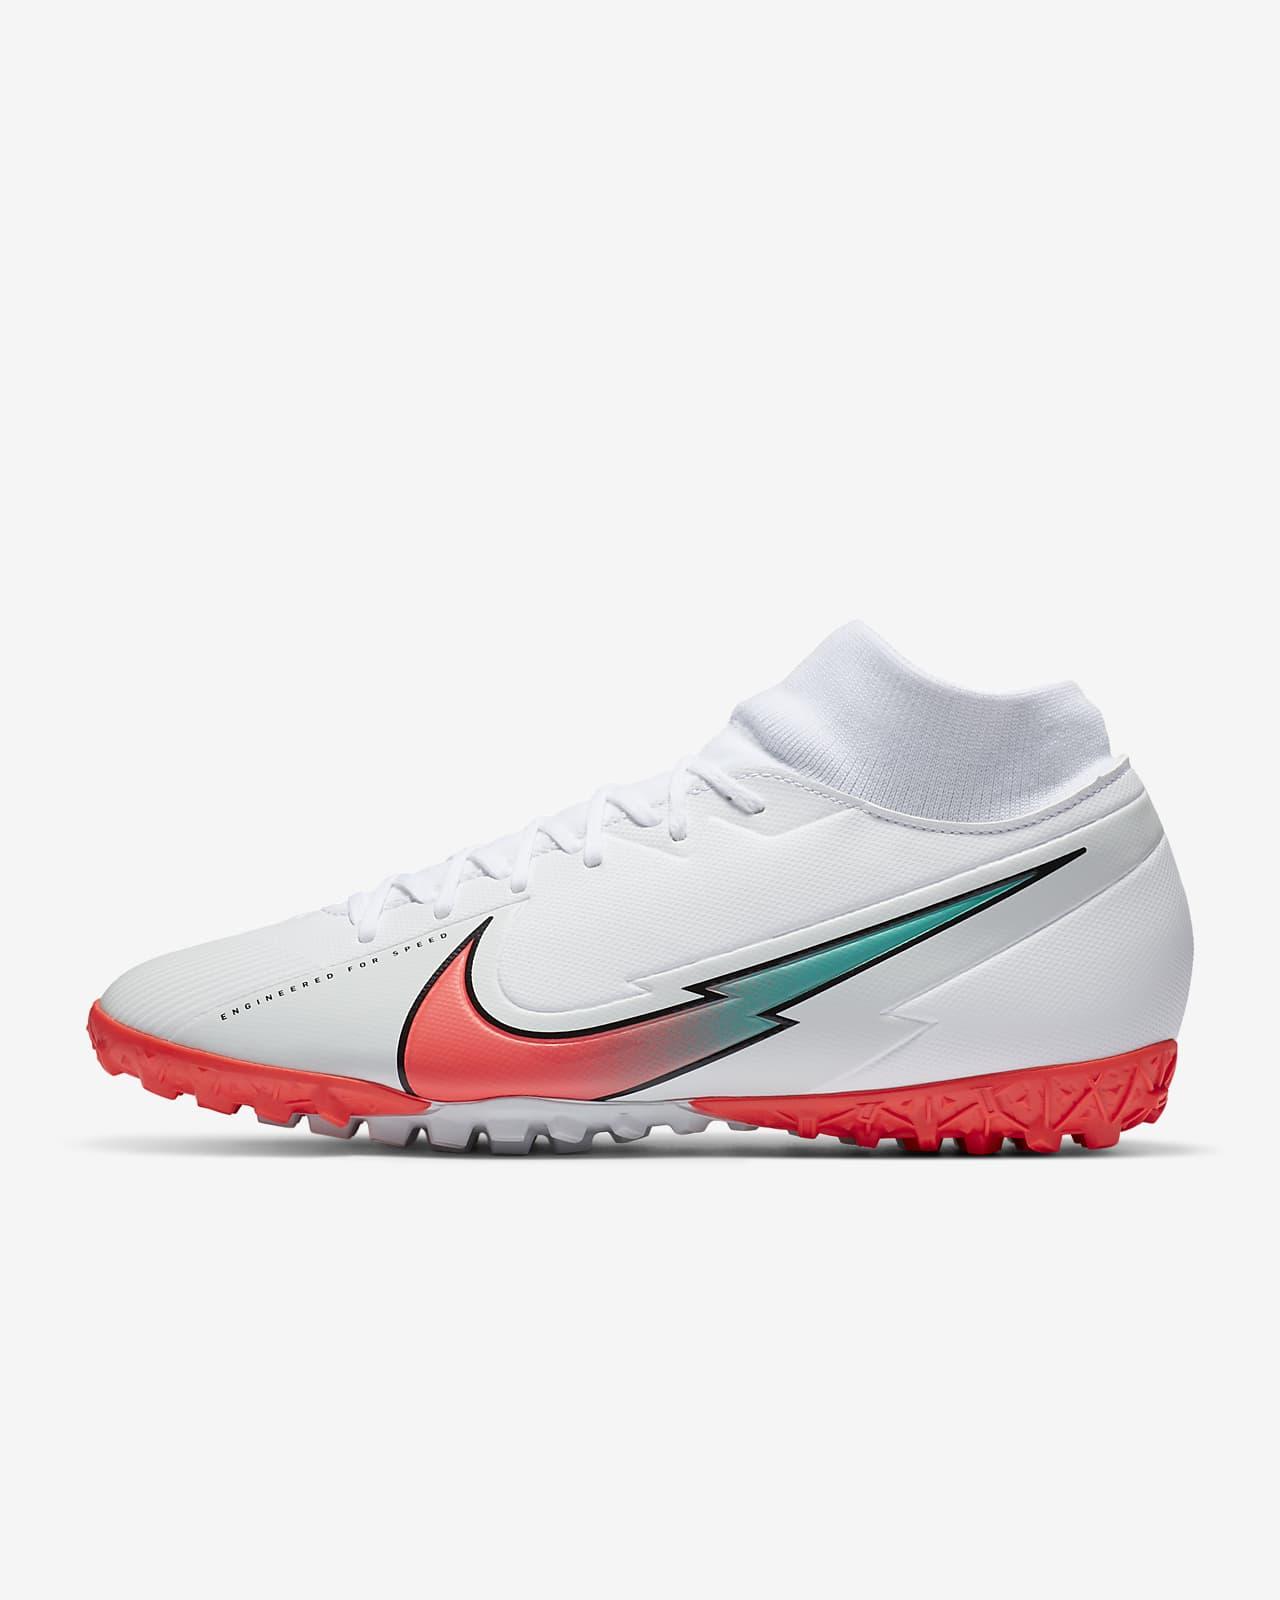 Nike Superfly 7 Academy TF 男/女人造场地足球鞋